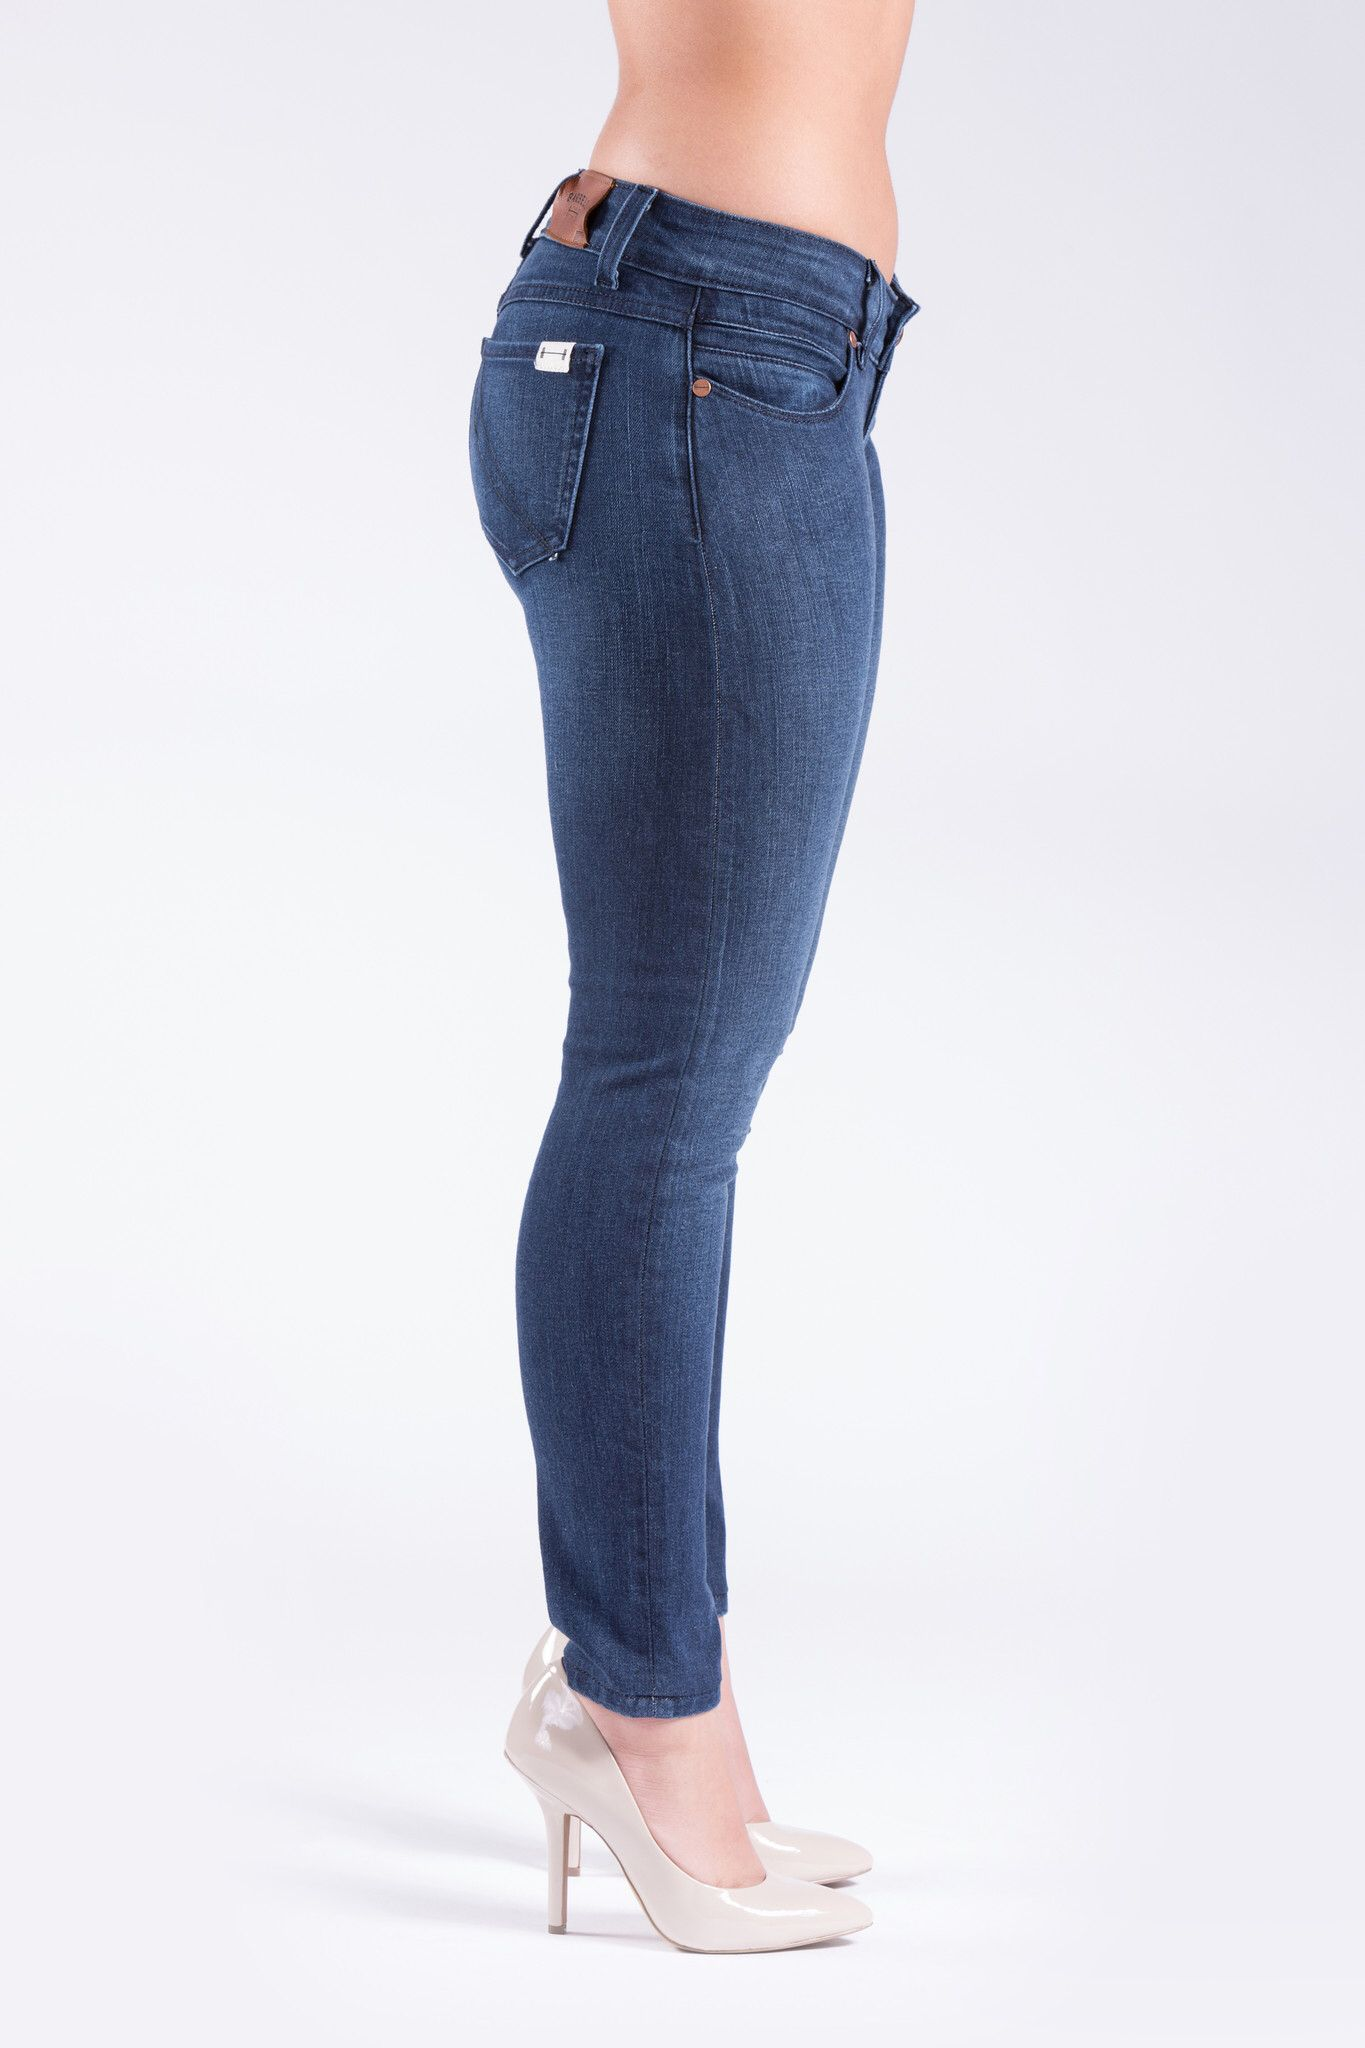 Barbell apparel womens blue fade slim athletic fit denim